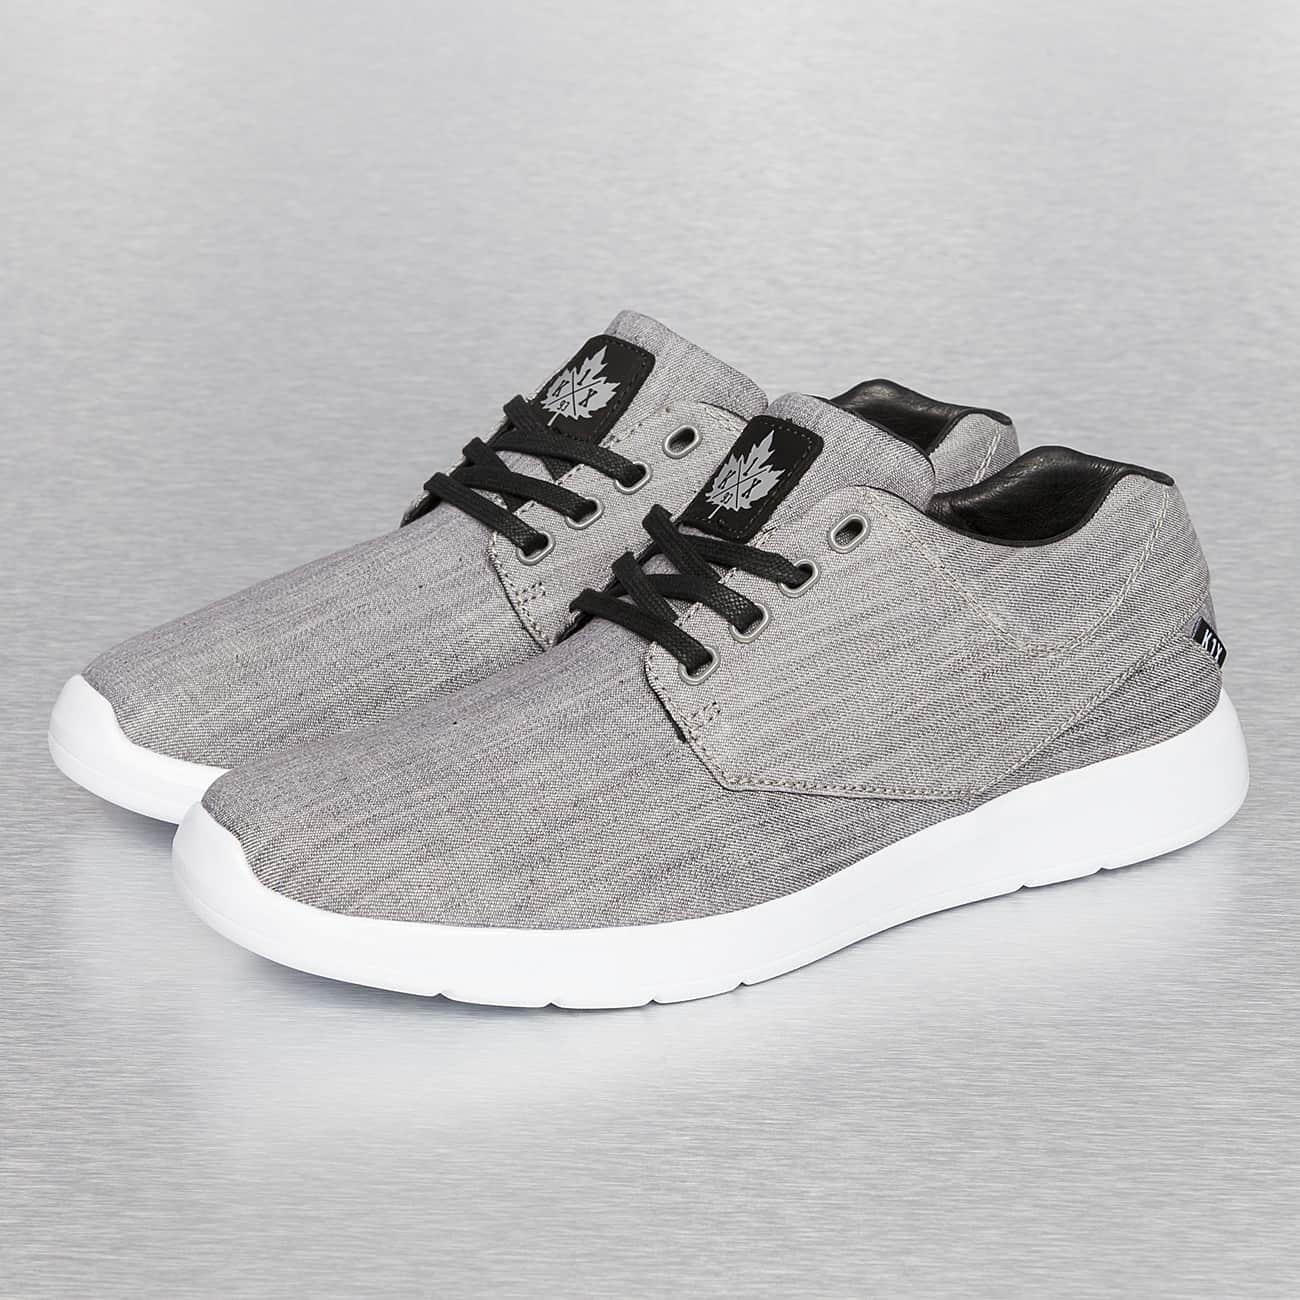 K1x Chaussures Noires En Taille 45 Hommes BeZVgqtX4